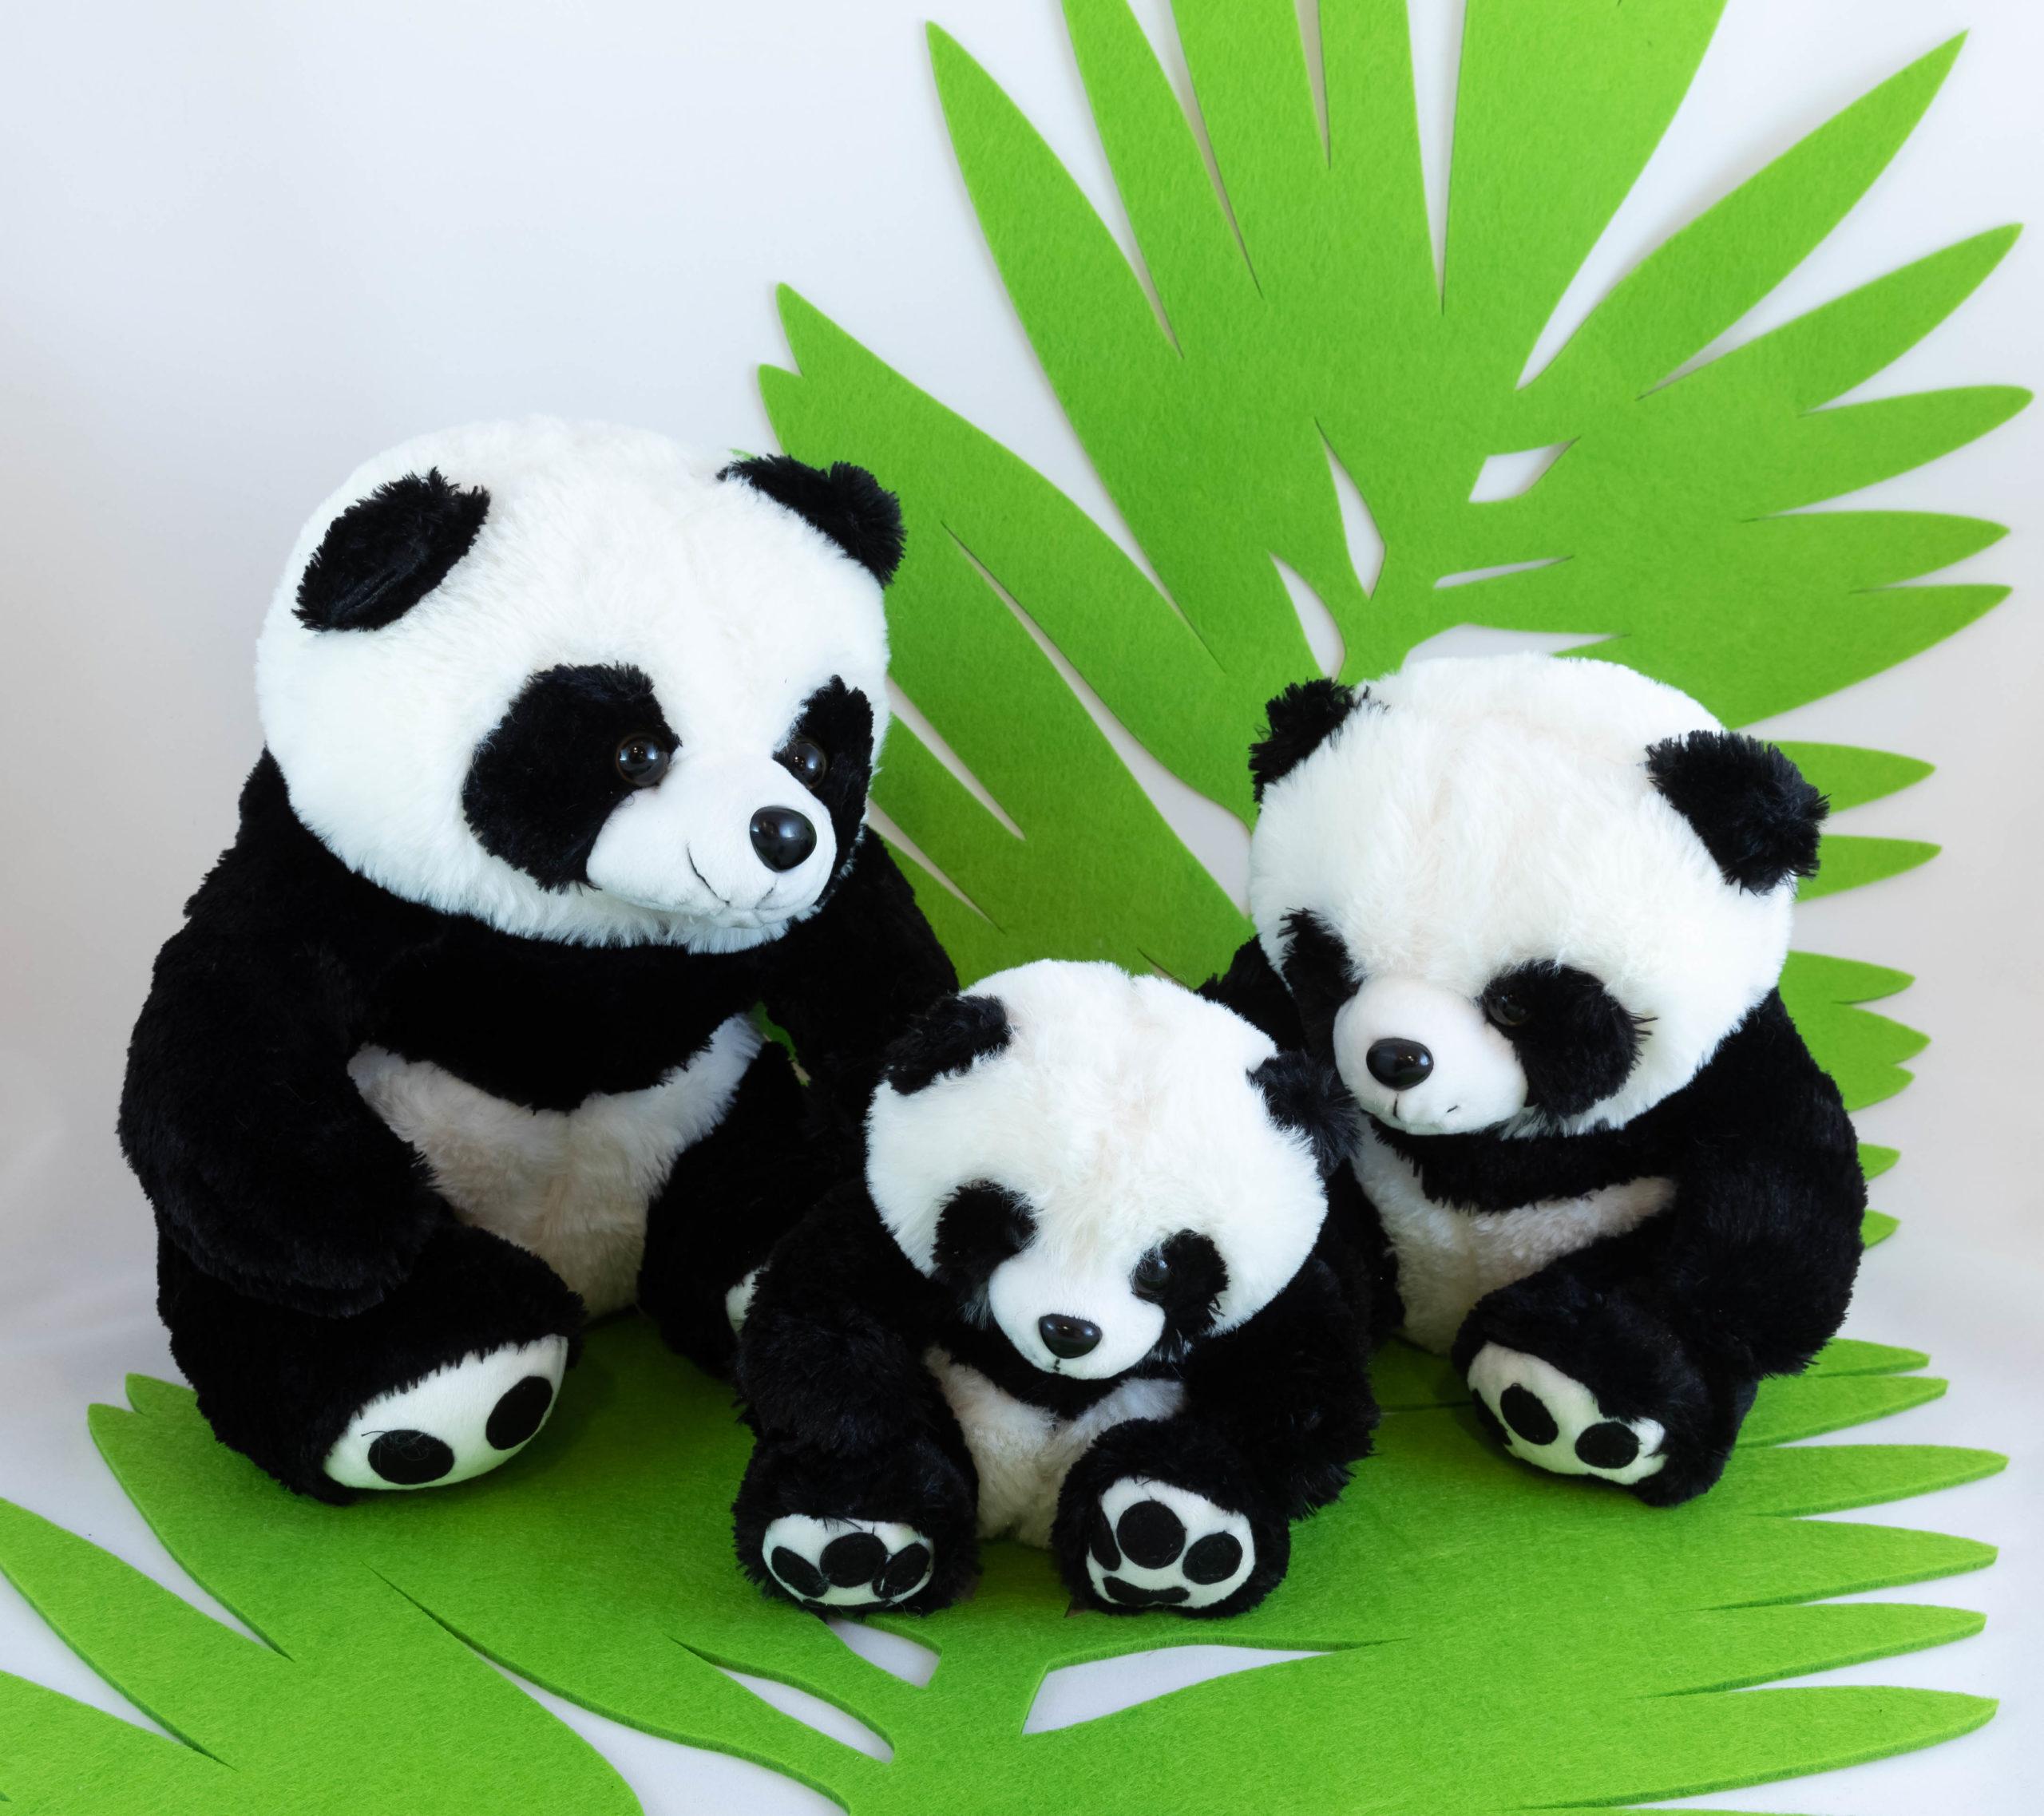 Peluche - Panda Image